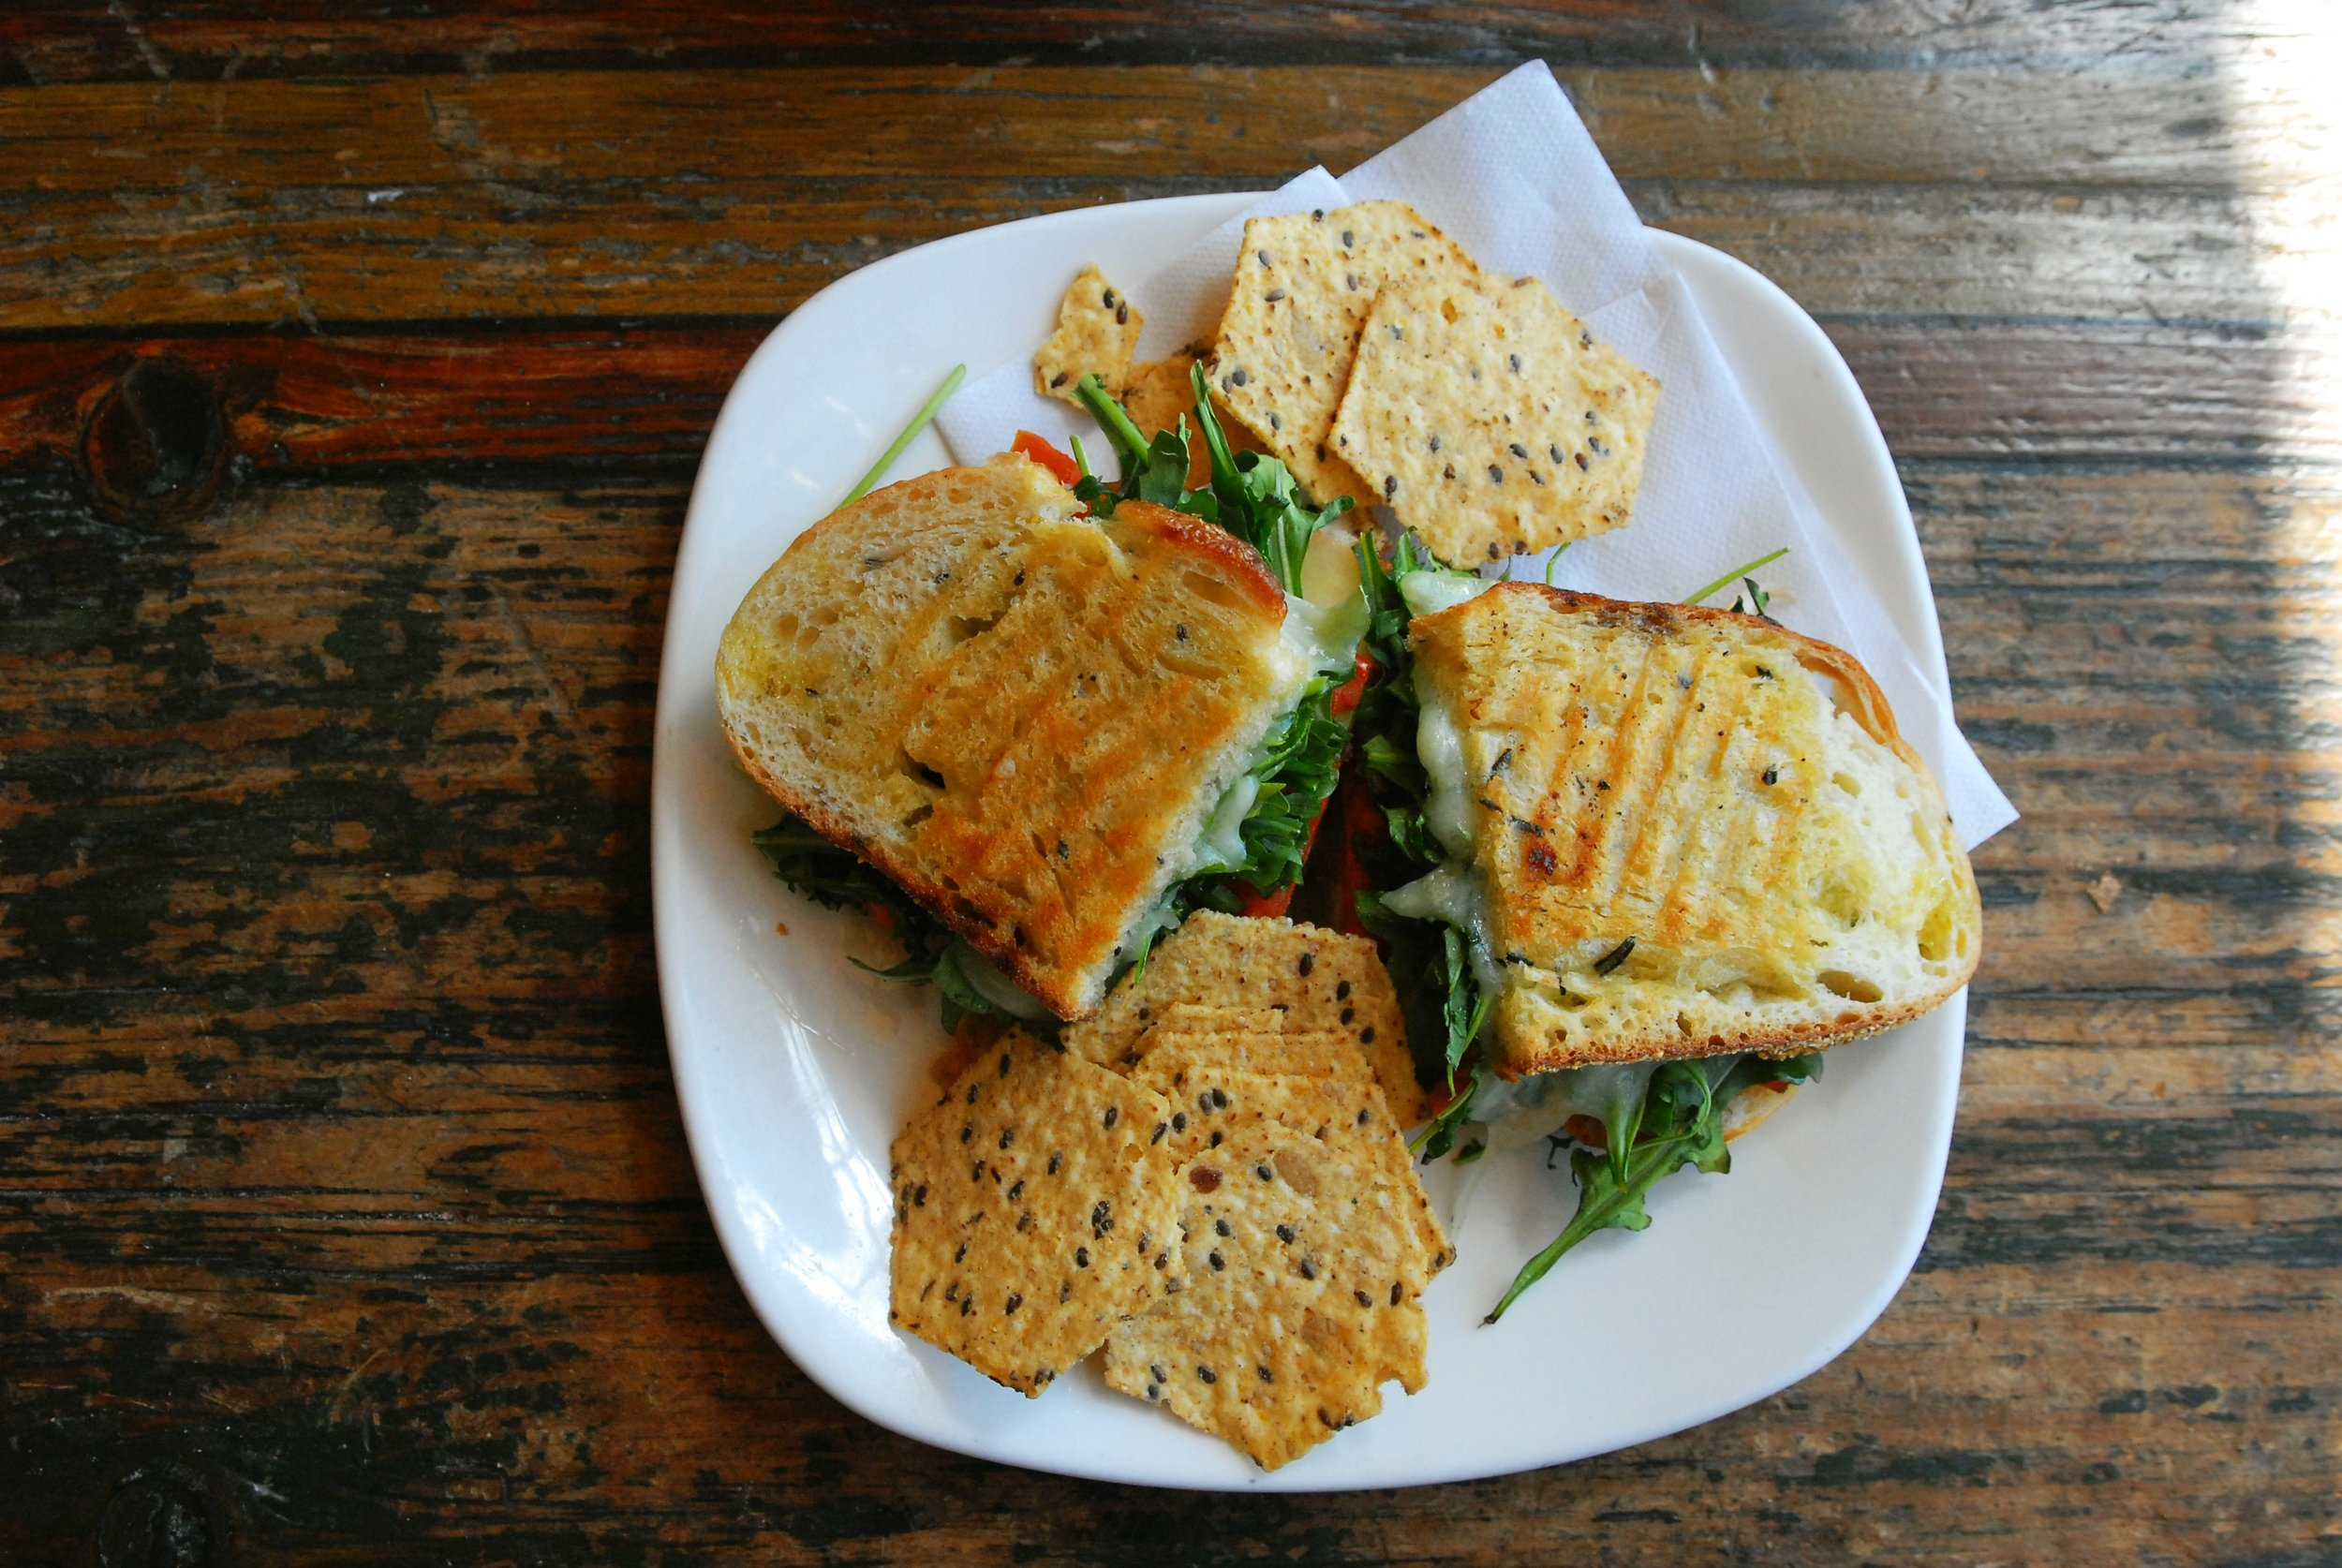 sandwich + chips.jpg